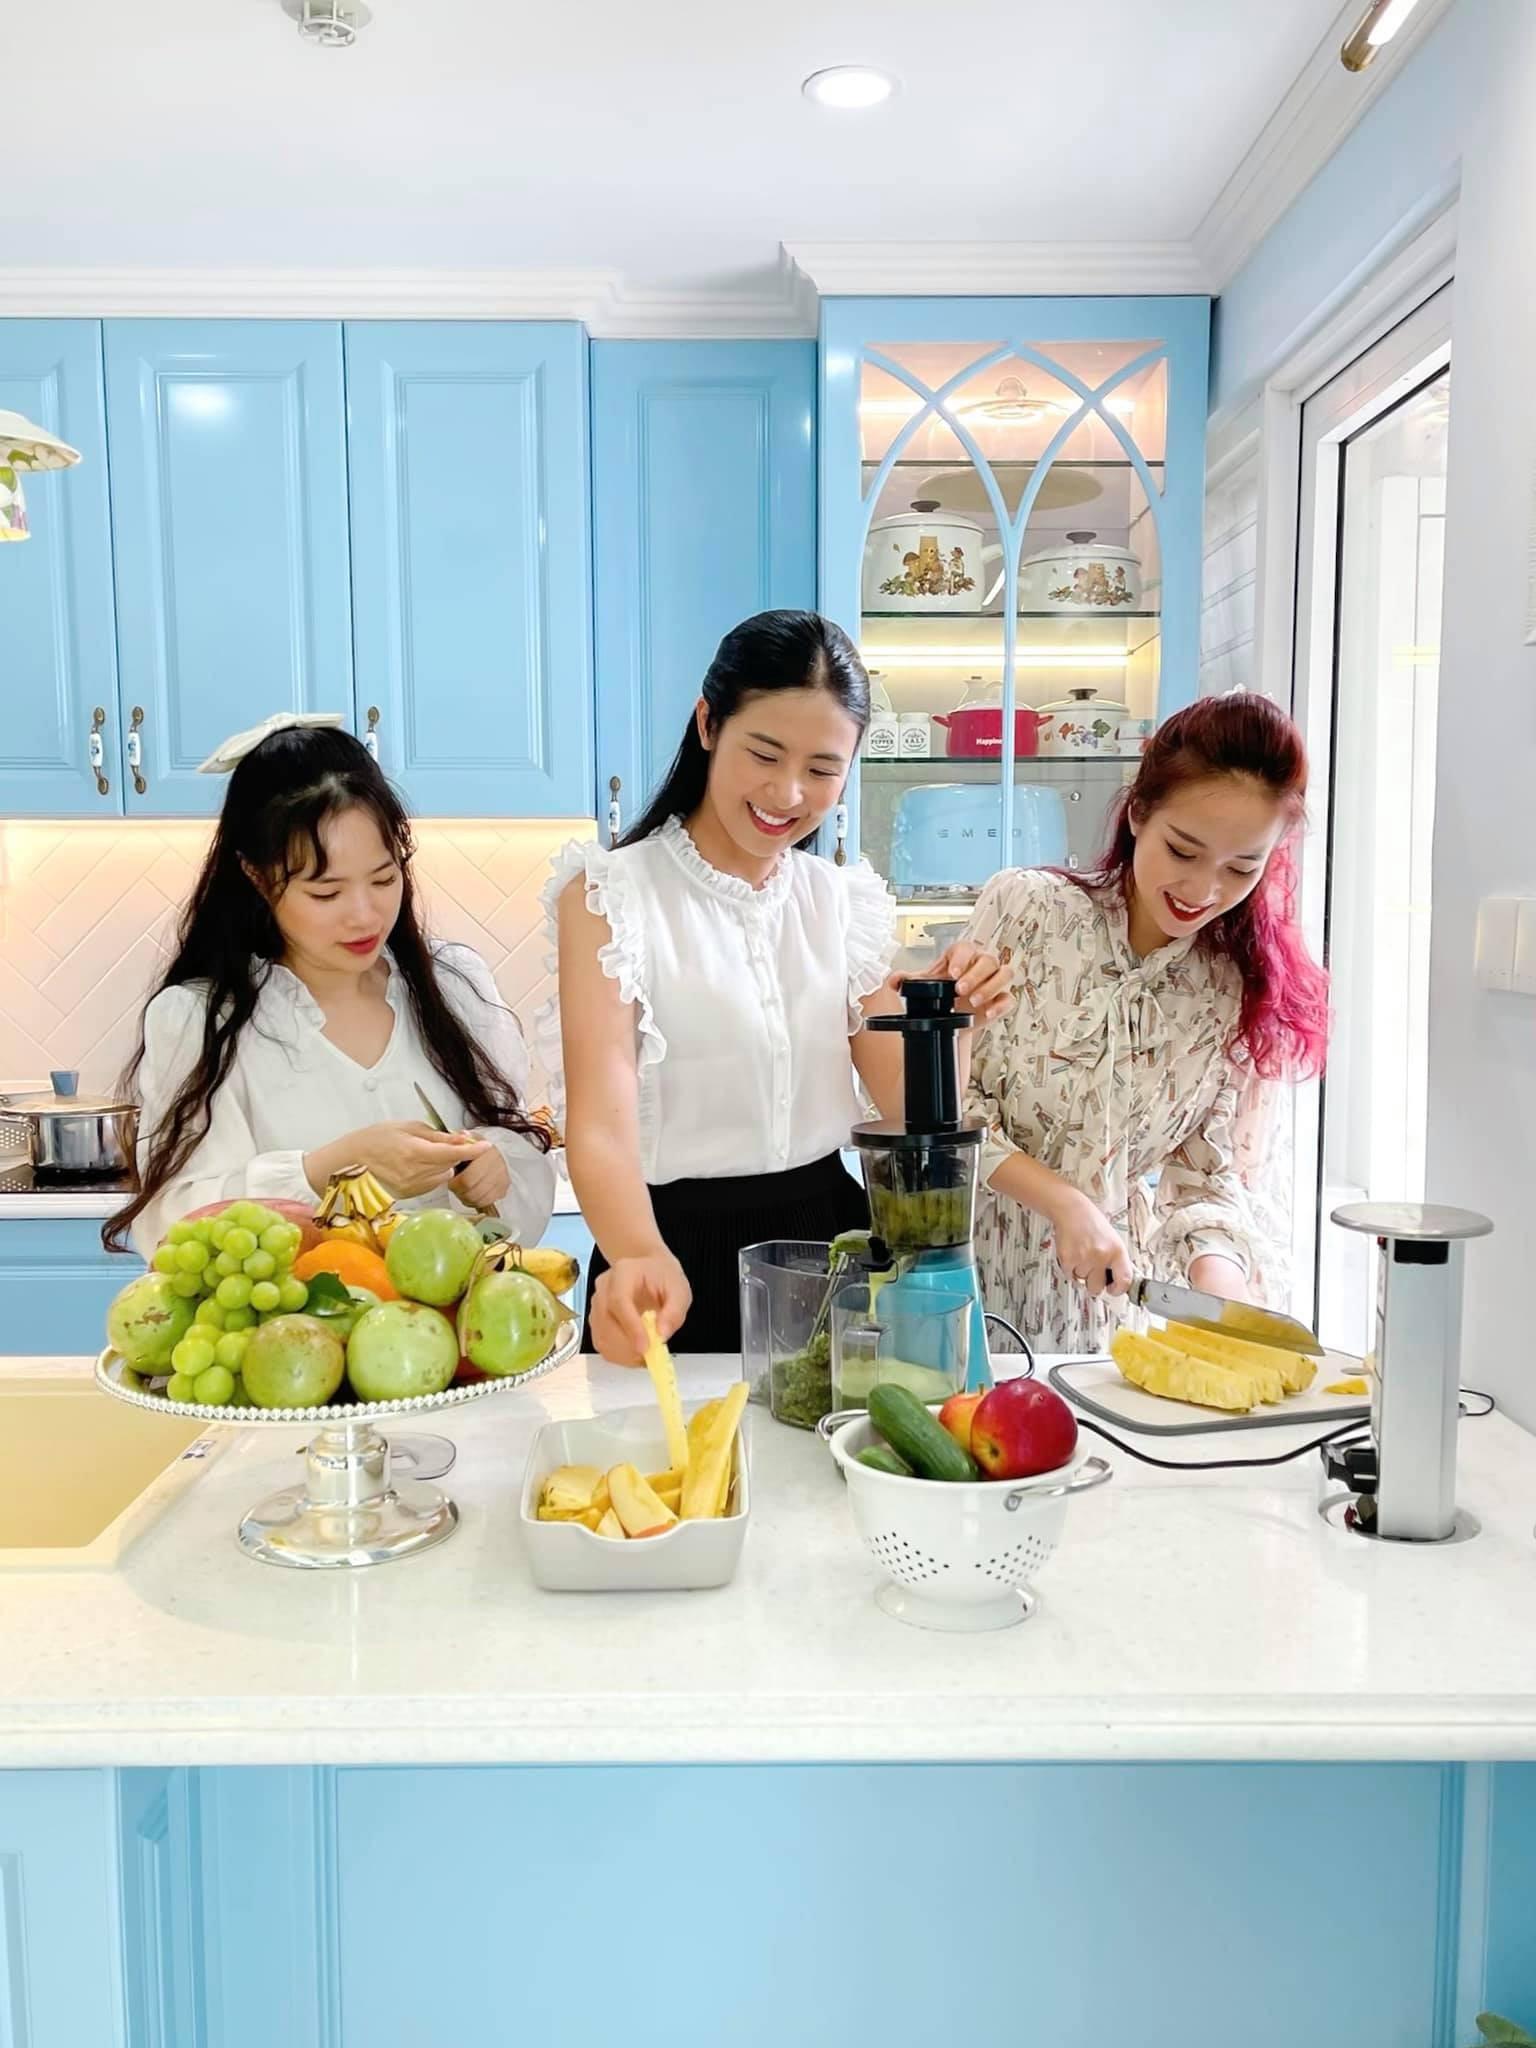 ngoc-han-3-1626257466.jpg